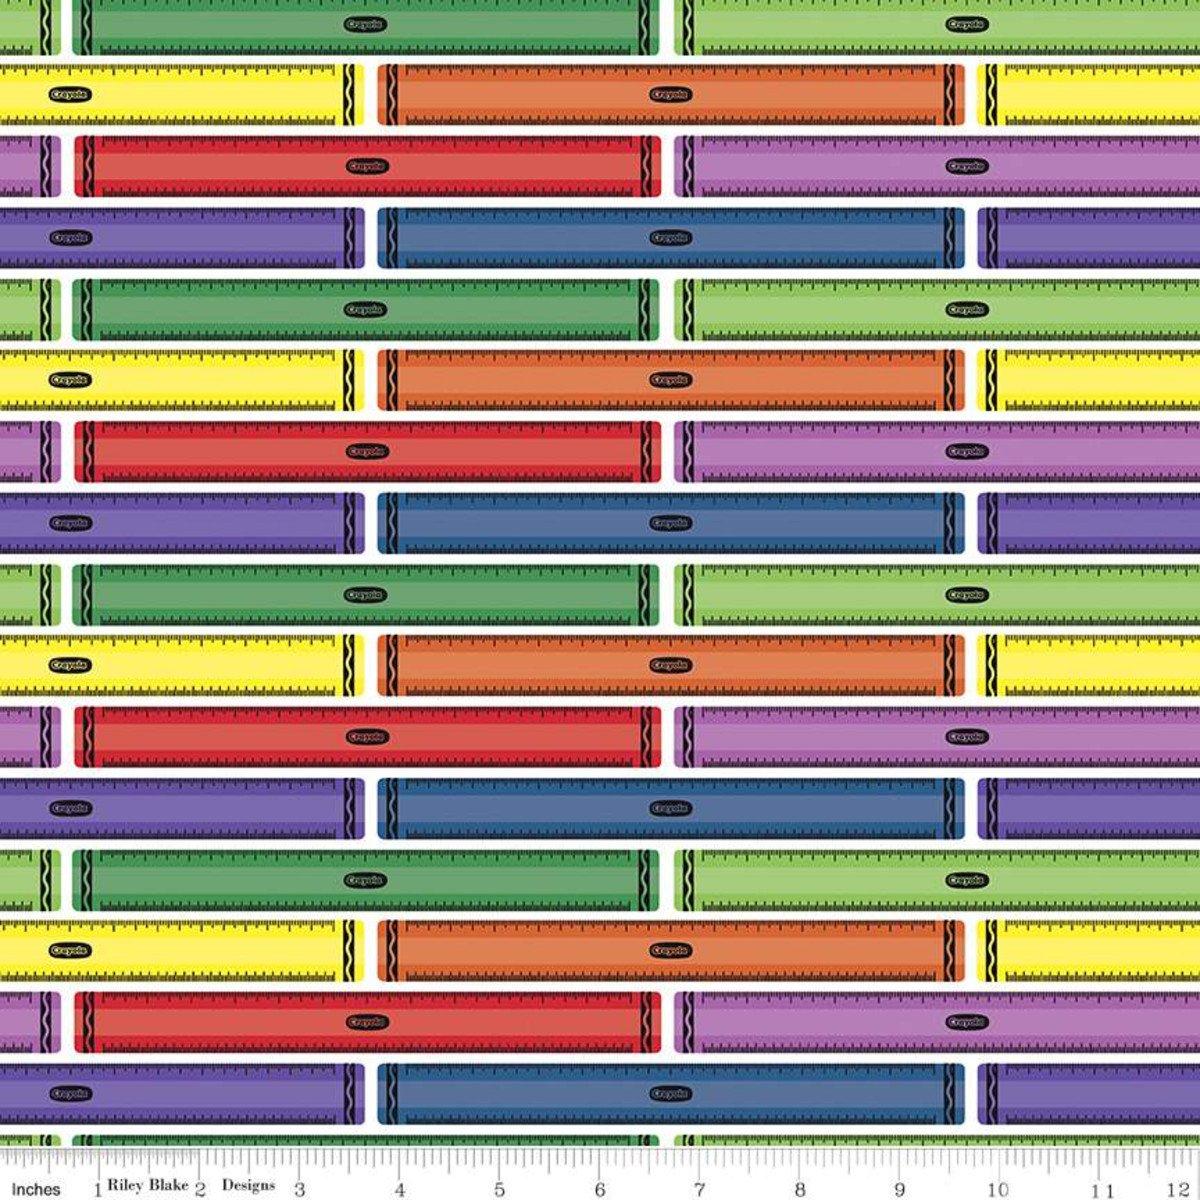 Fabric I Dream in Color Ruler C8802-White